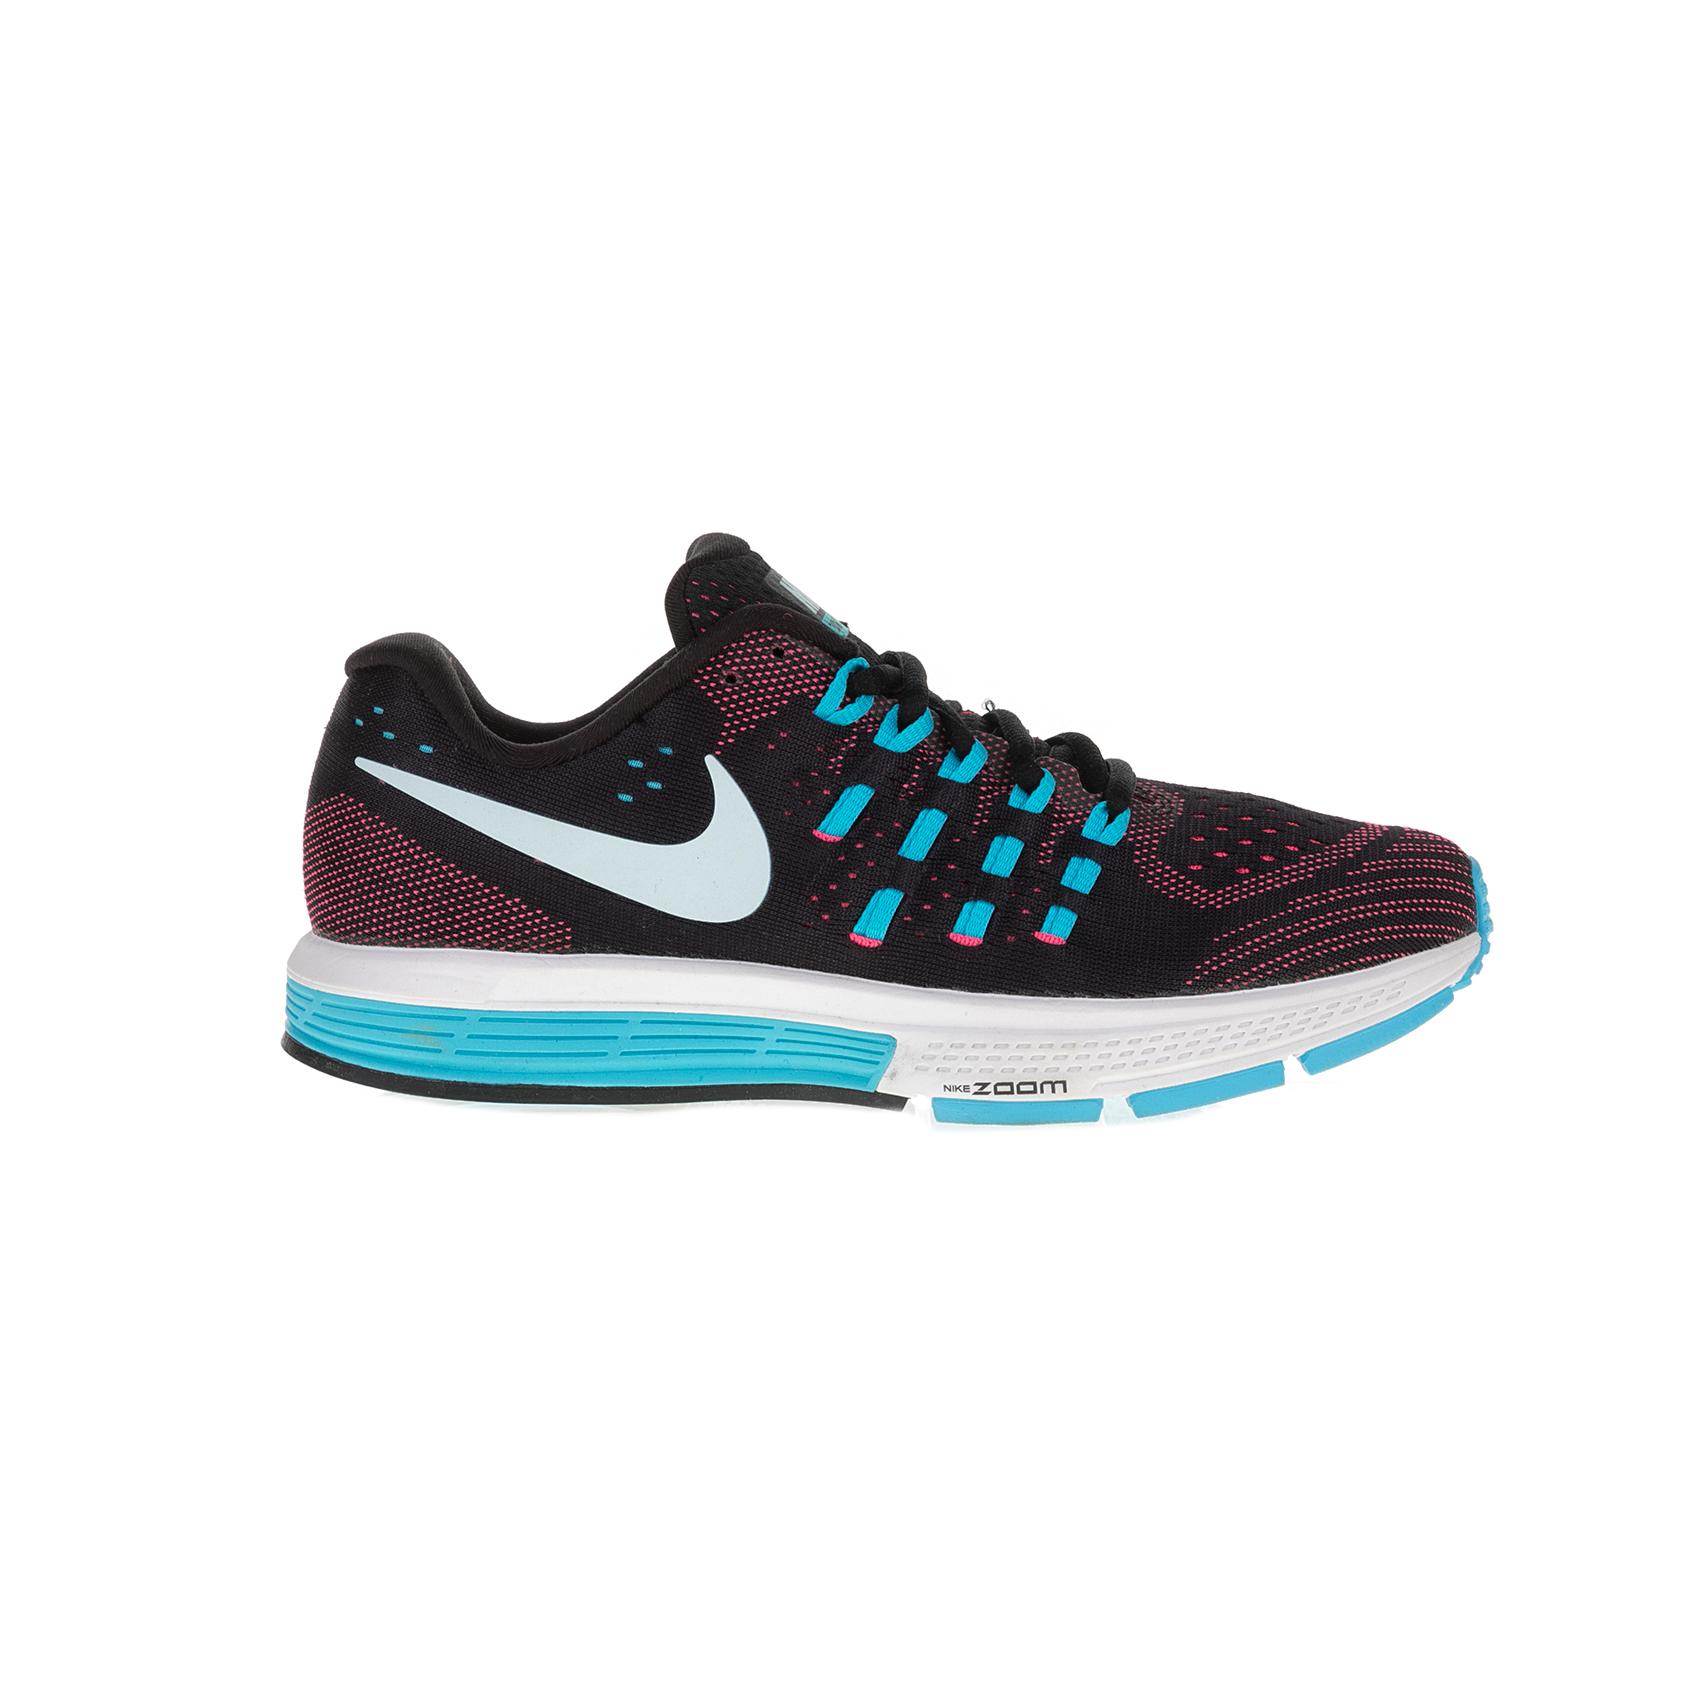 NIKE – Γυναικεία αθλητικά παπούτσια Nike AIR ZOOM VOMERO 11 μαύρα